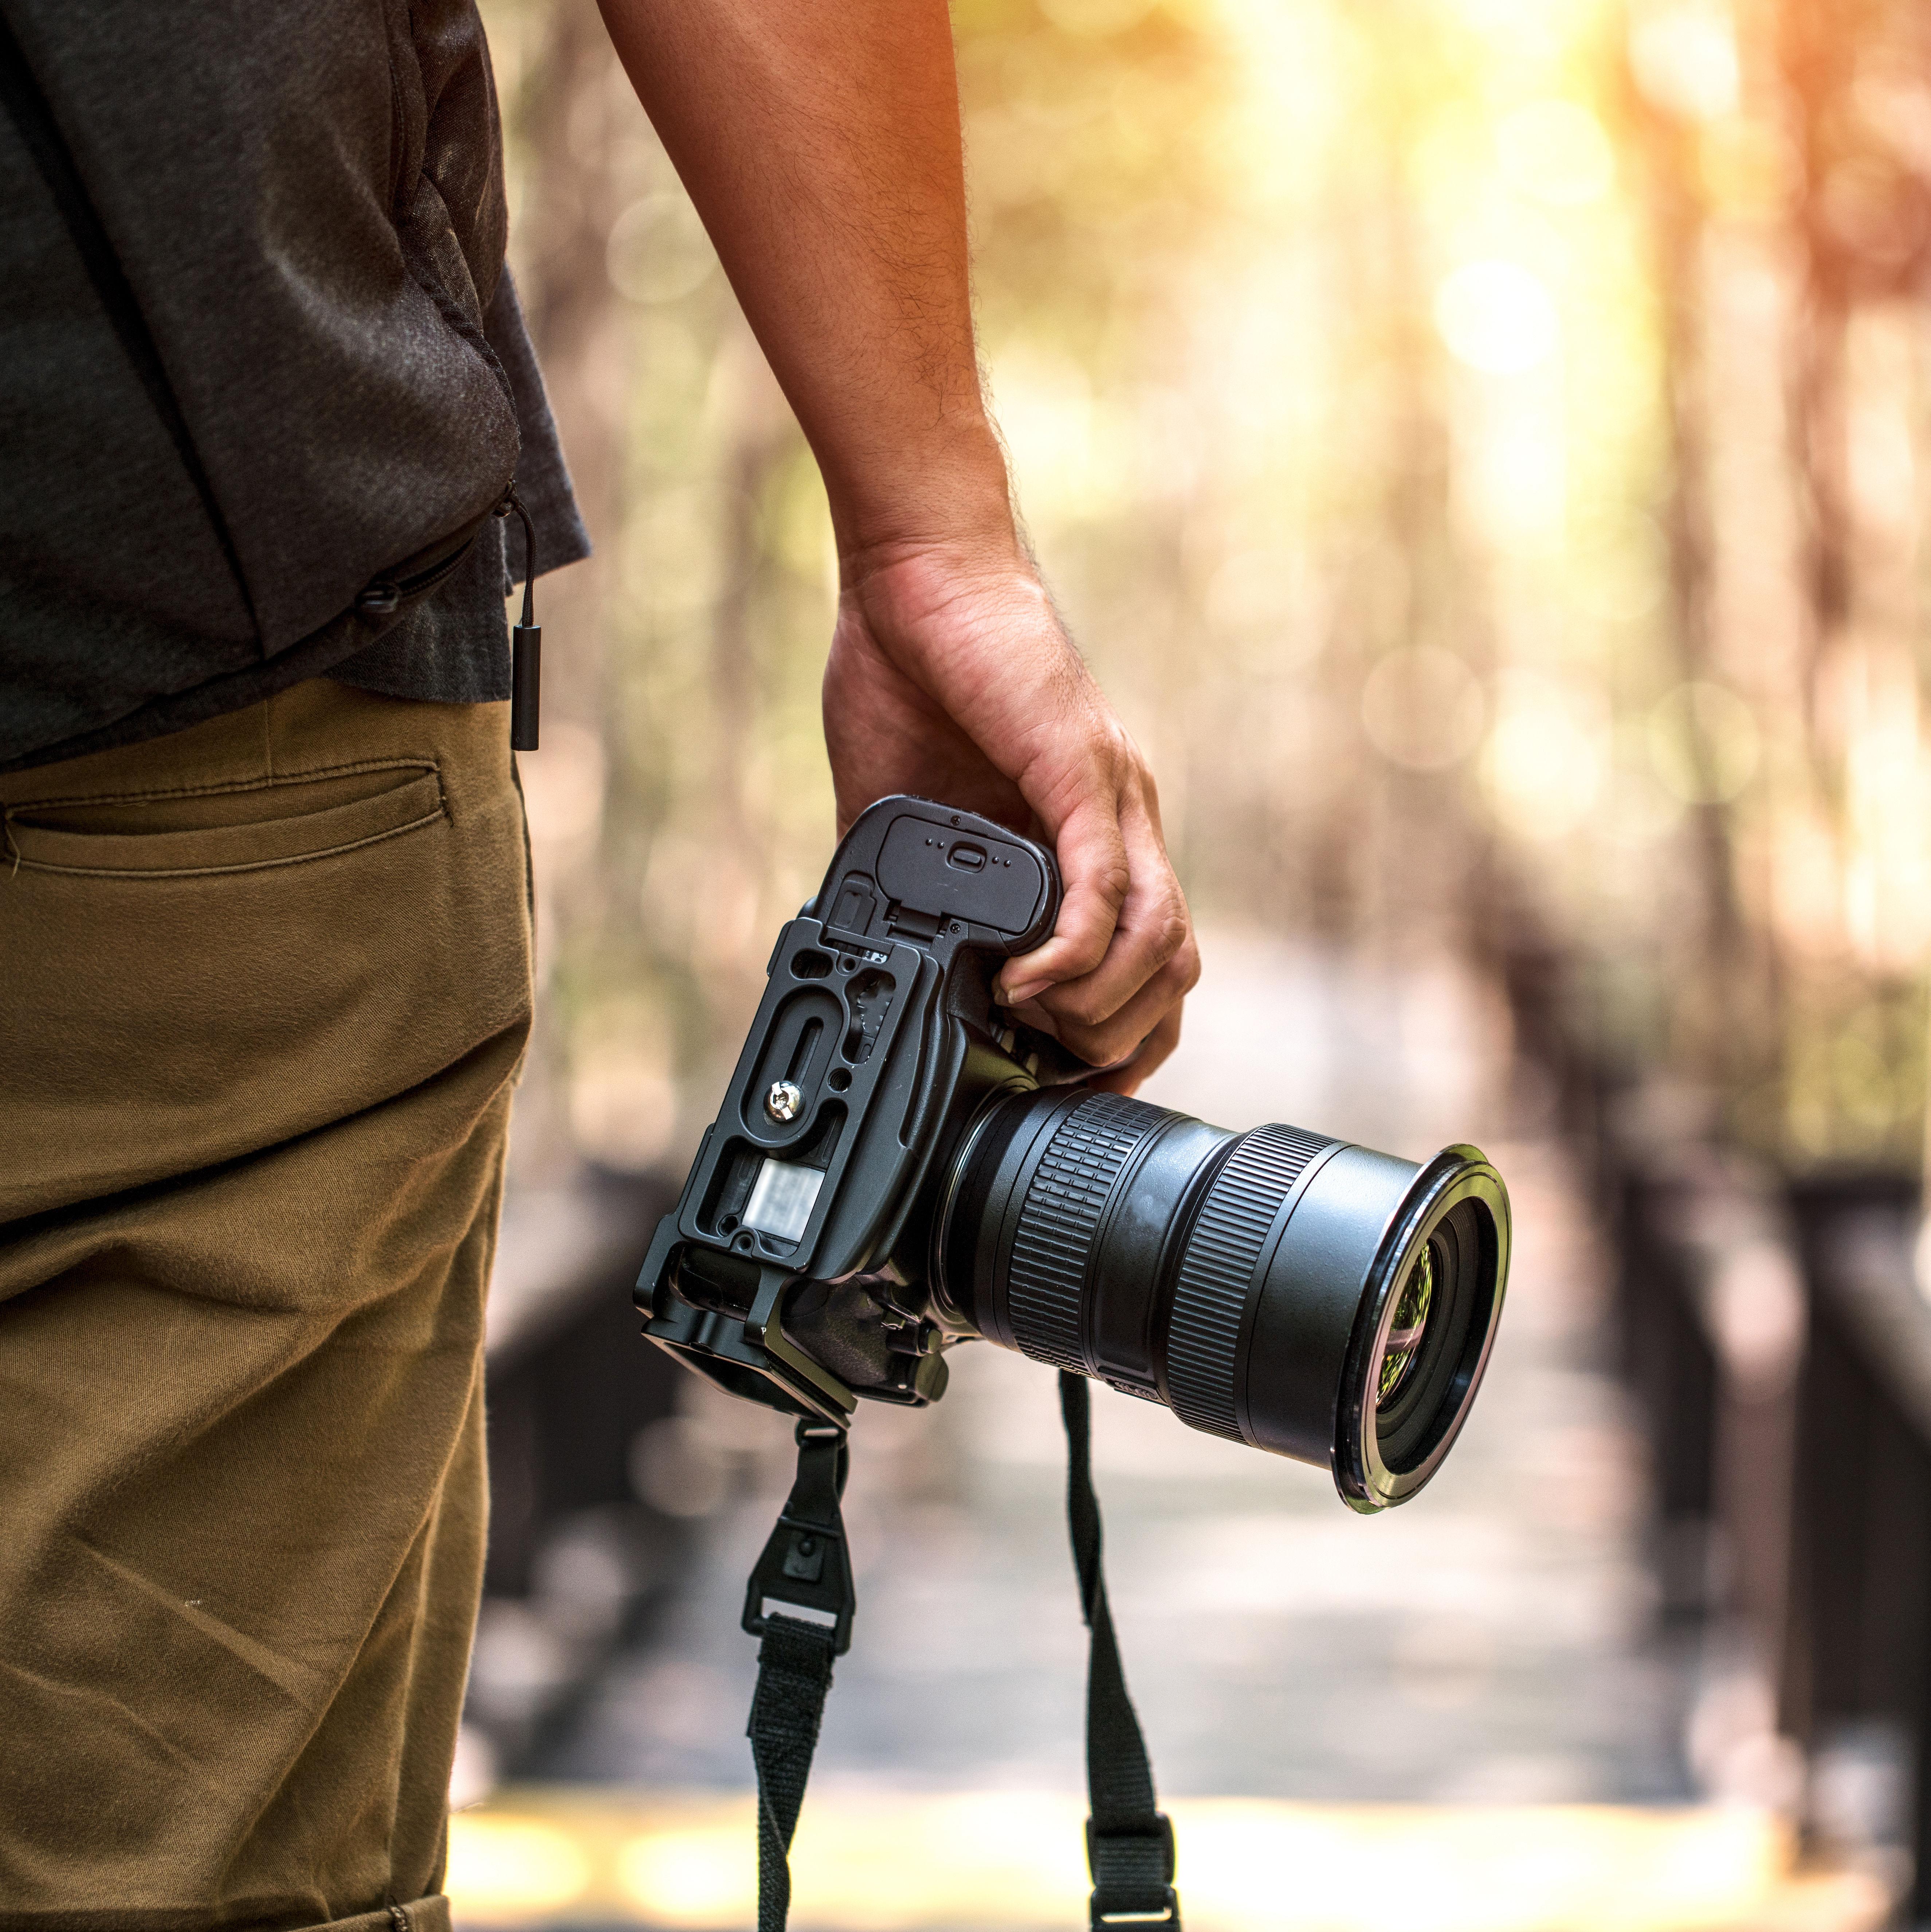 Learn basics of photography Photo Basics #1: Introduction and Exposure